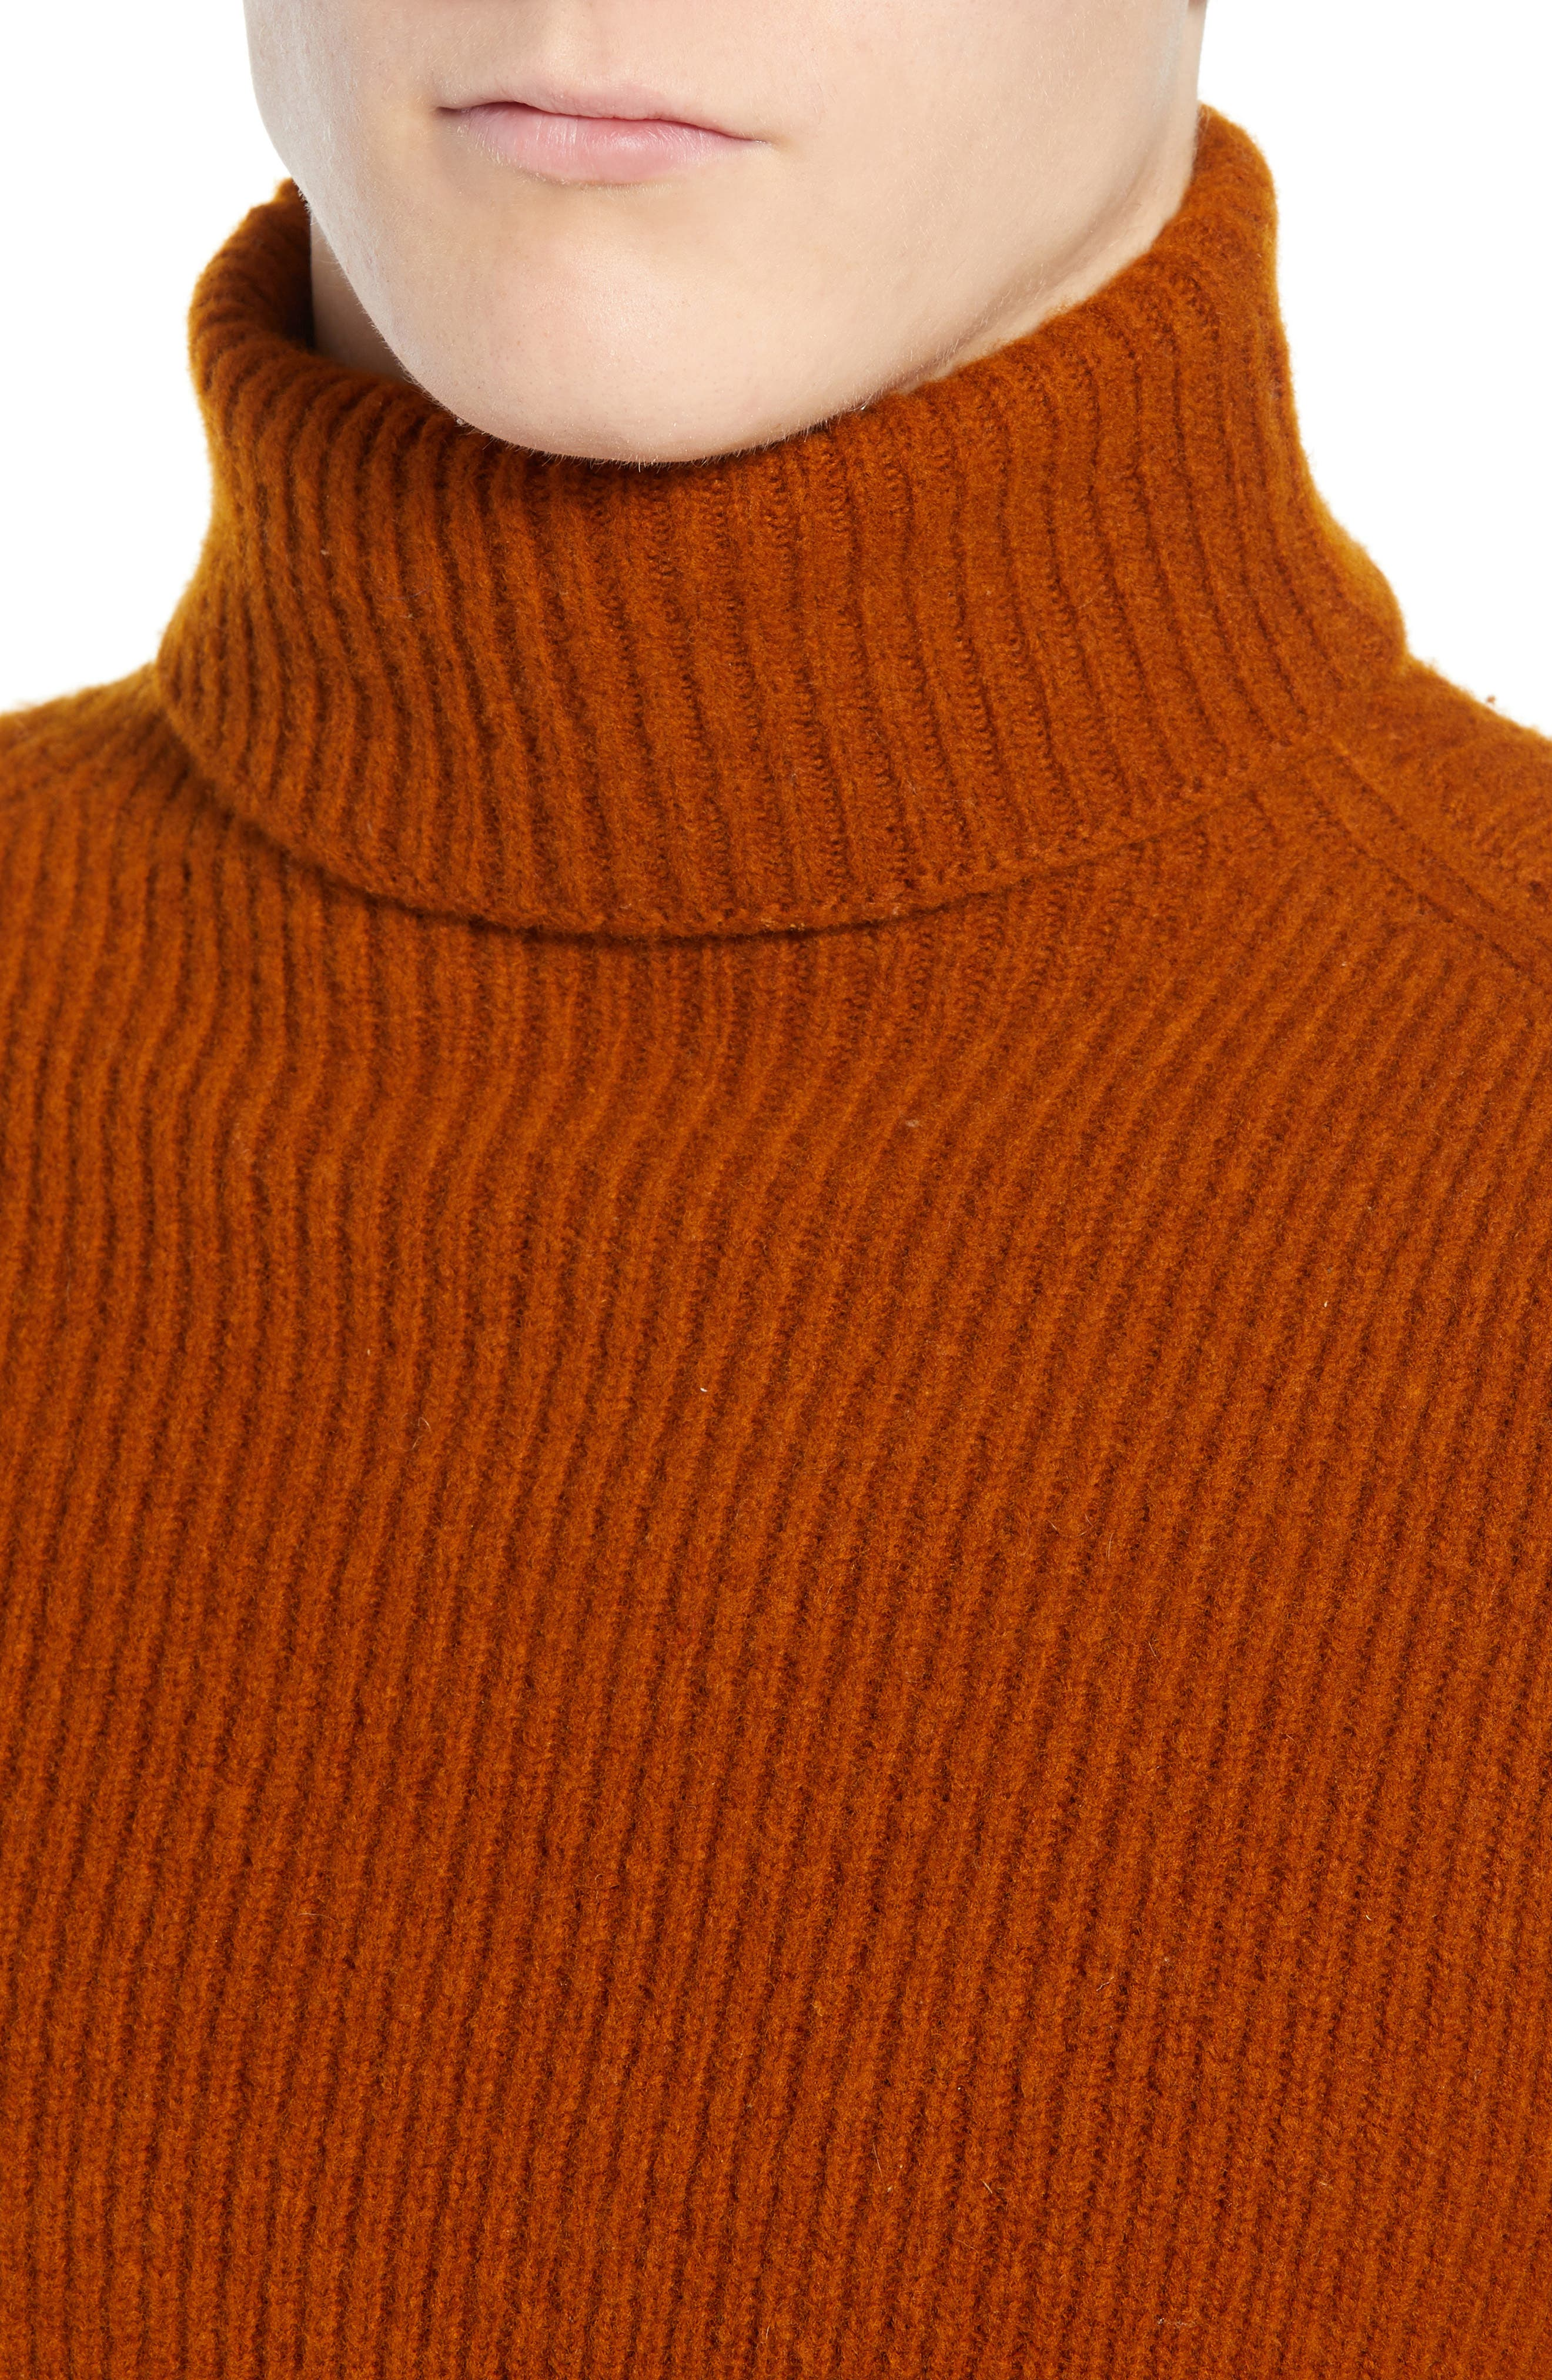 Wool Blend Turtleneck Sweater,                             Alternate thumbnail 4, color,                             RUSSET BROWN